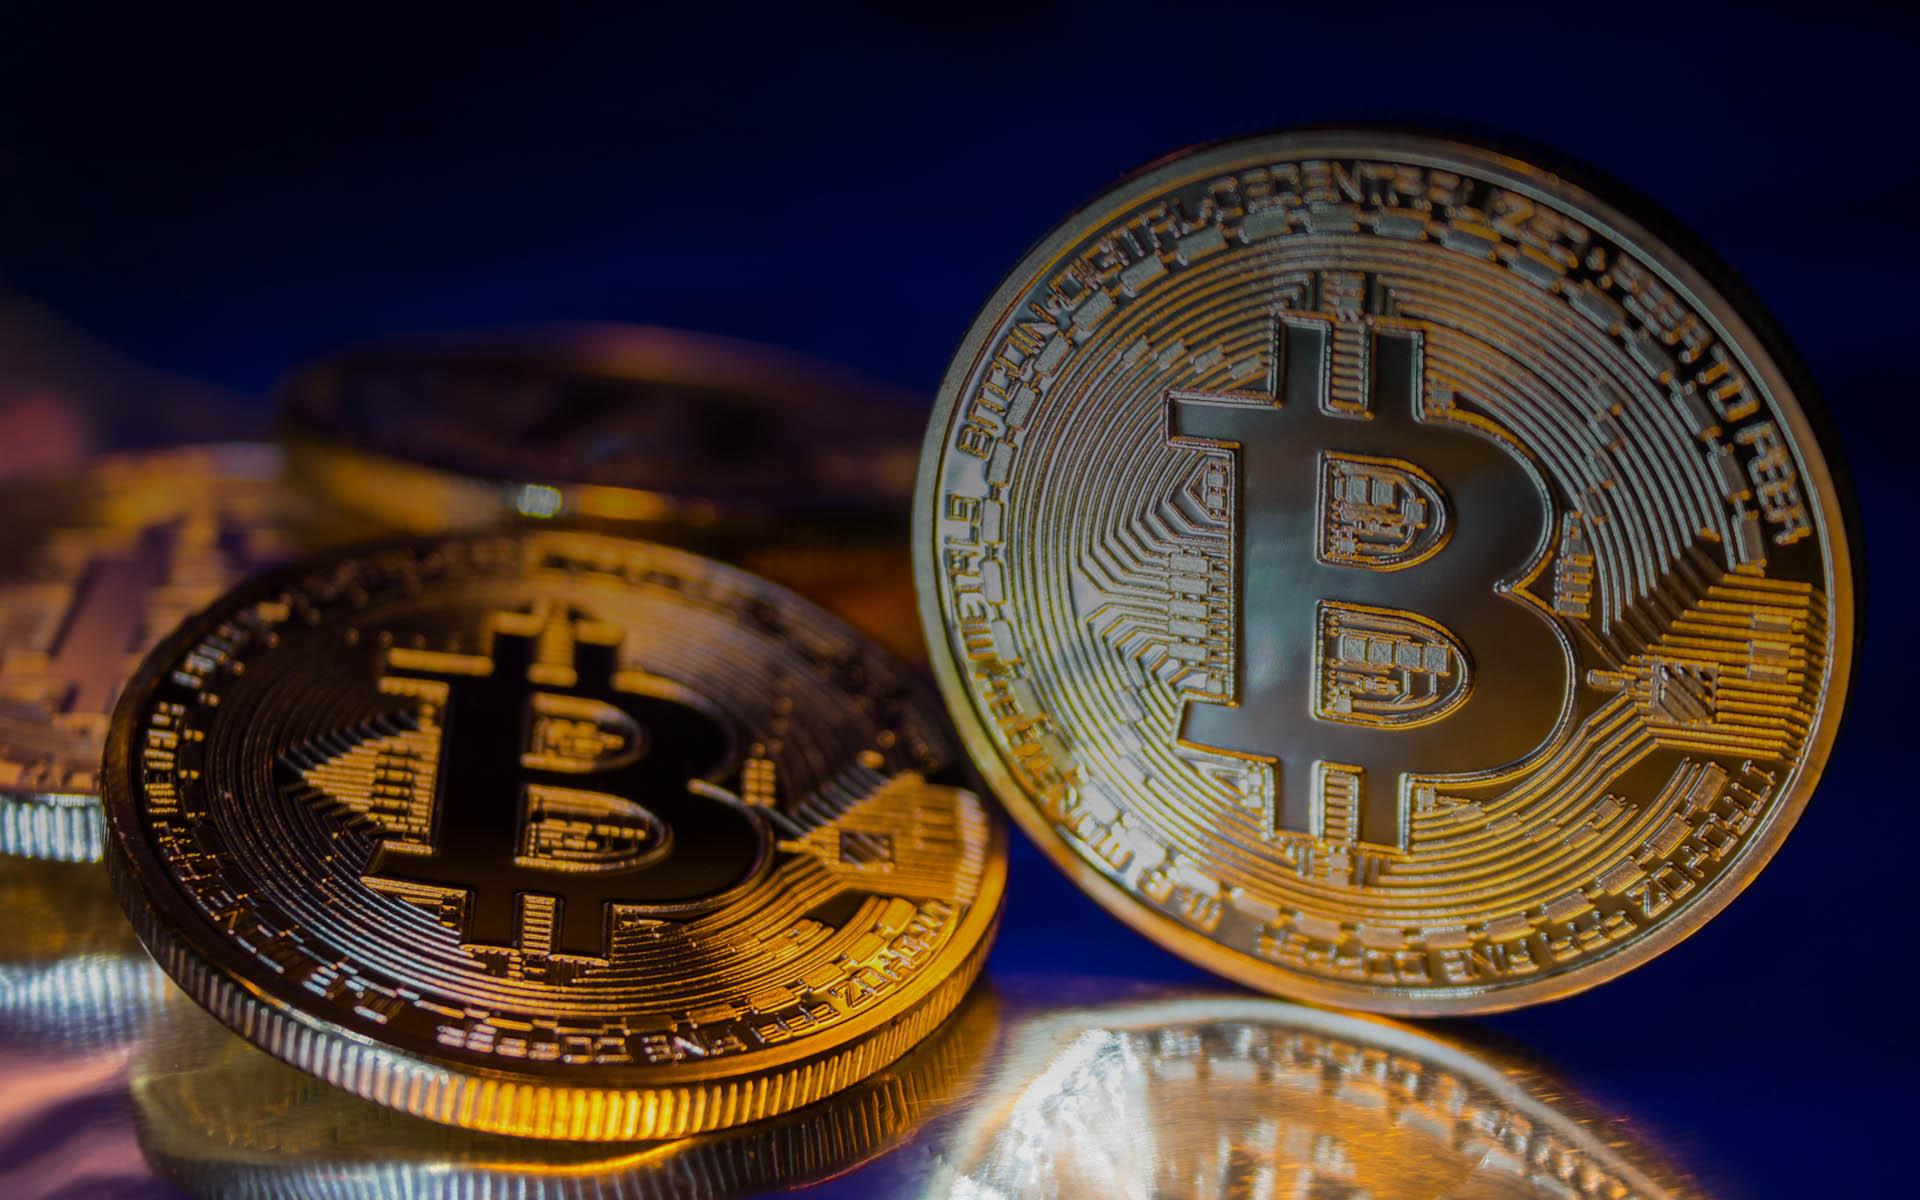 Q: When is a Bitcoin not a Bitcoin? A: When it's Cash!